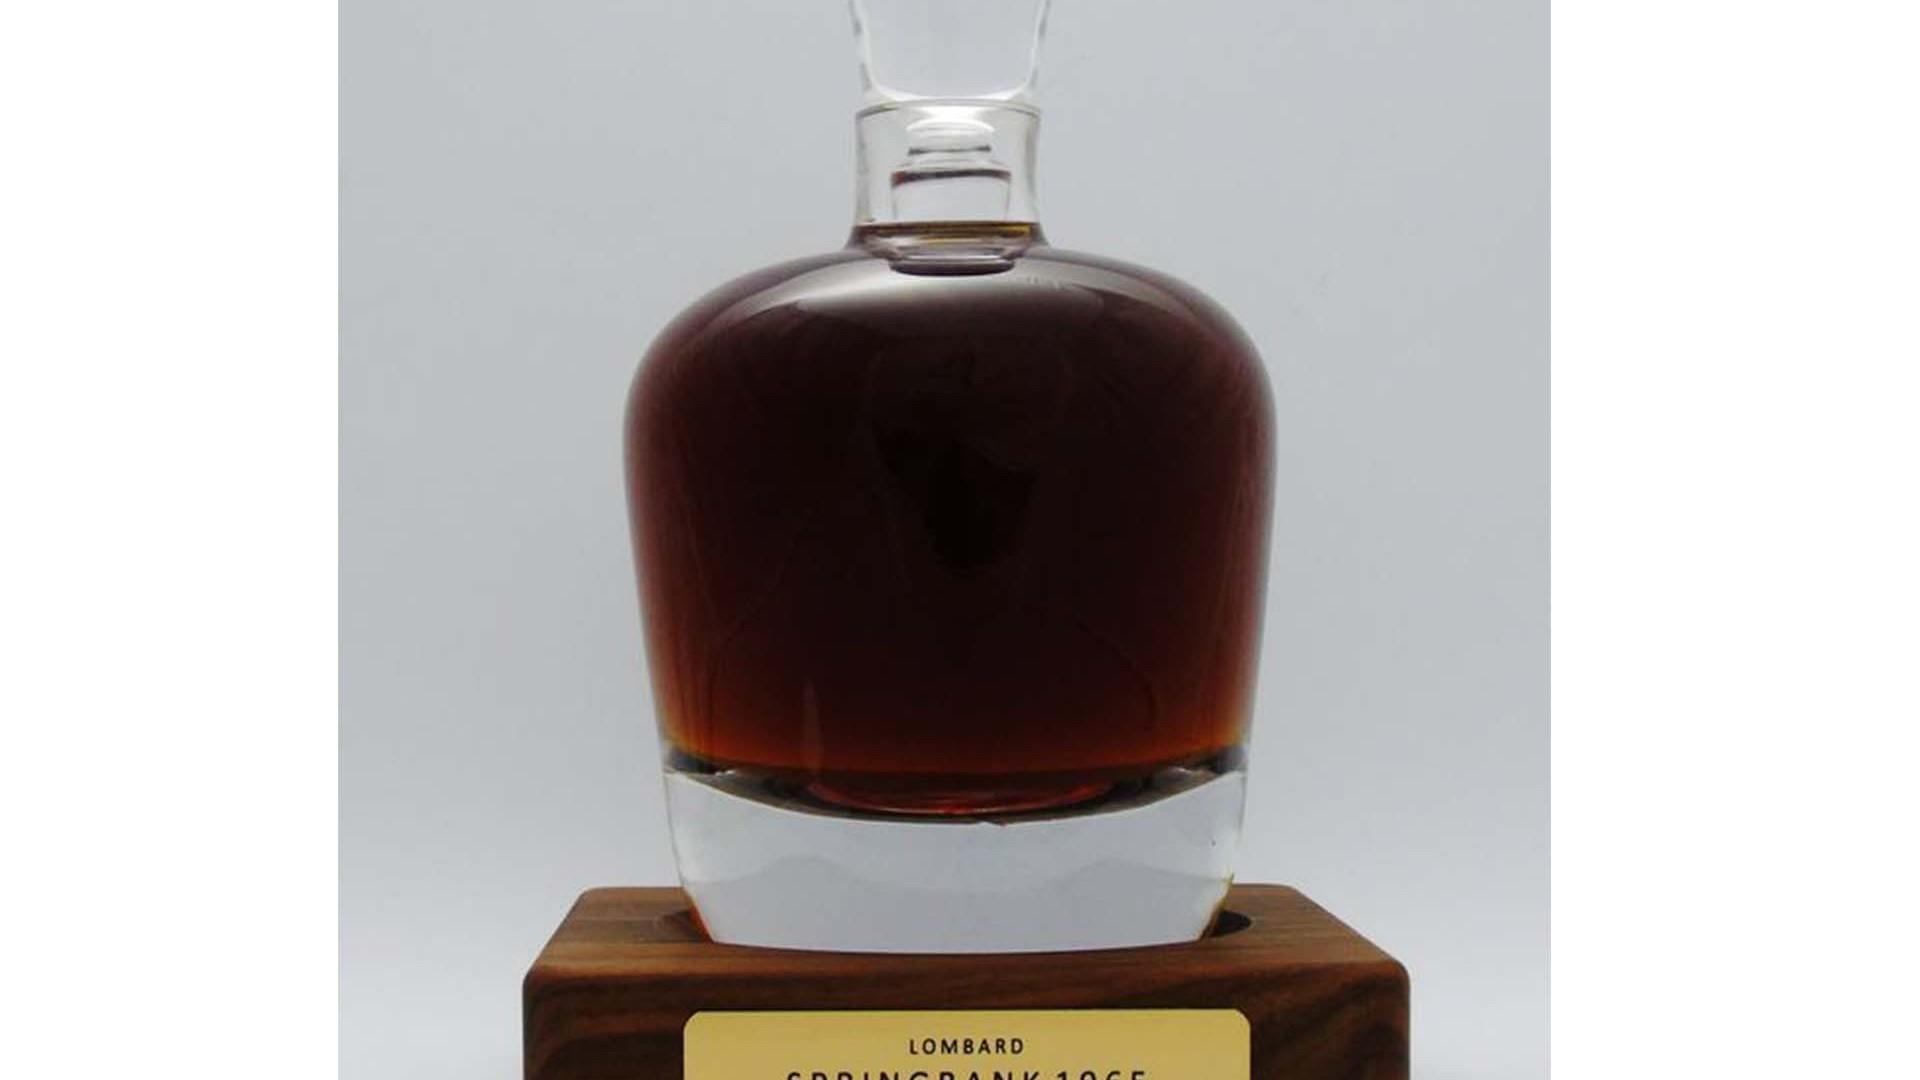 Springbank 1965 Lombard Bottling